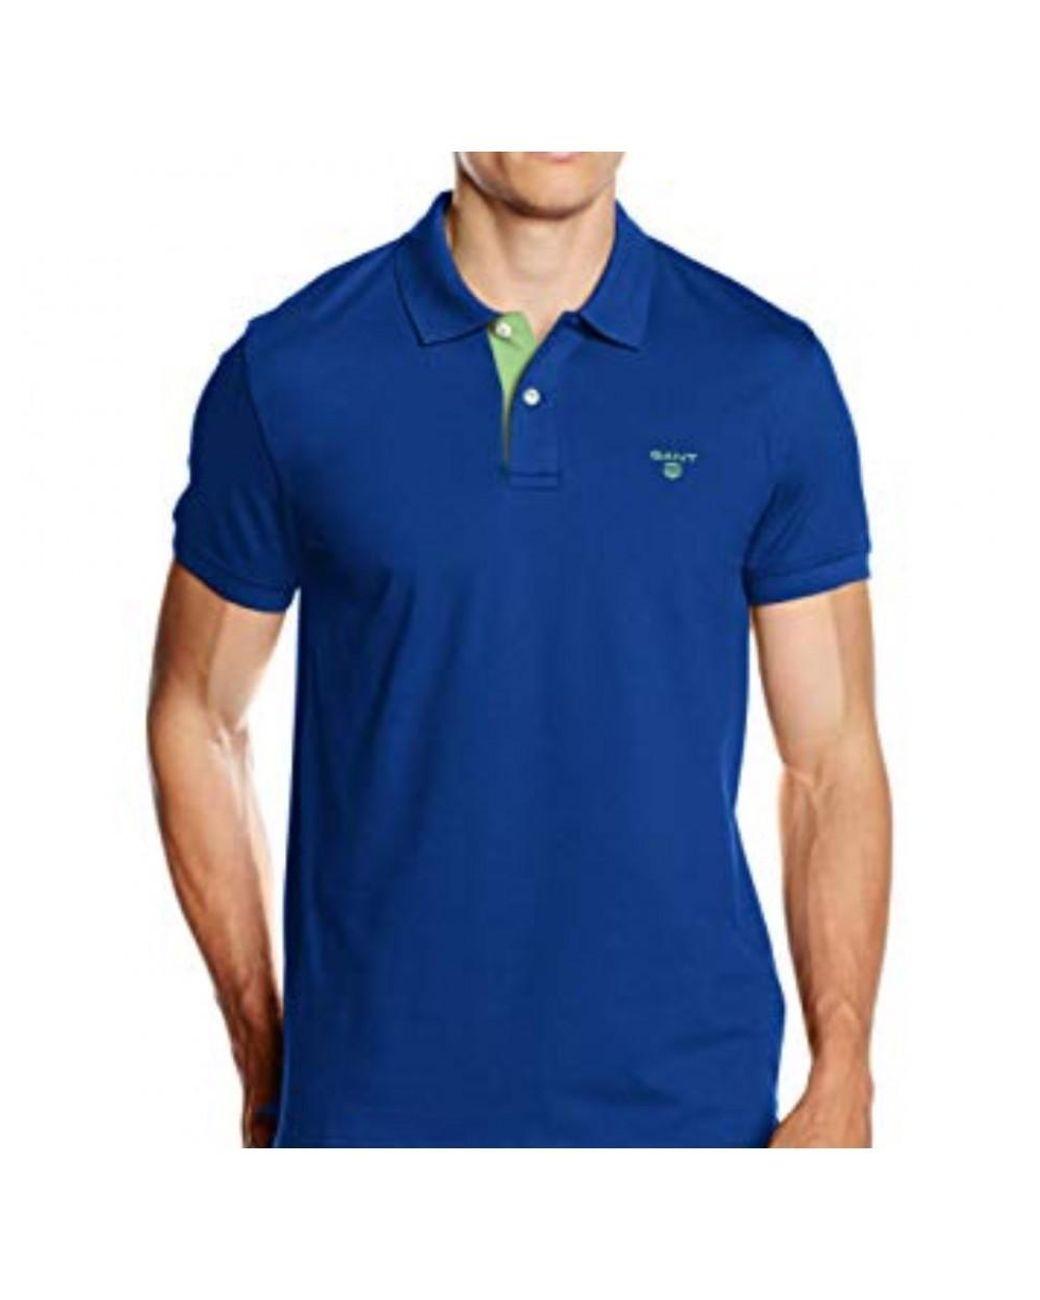 Gant Women/'s Apricot Short Sleeve Crewneck T-Shirt $50 NEW